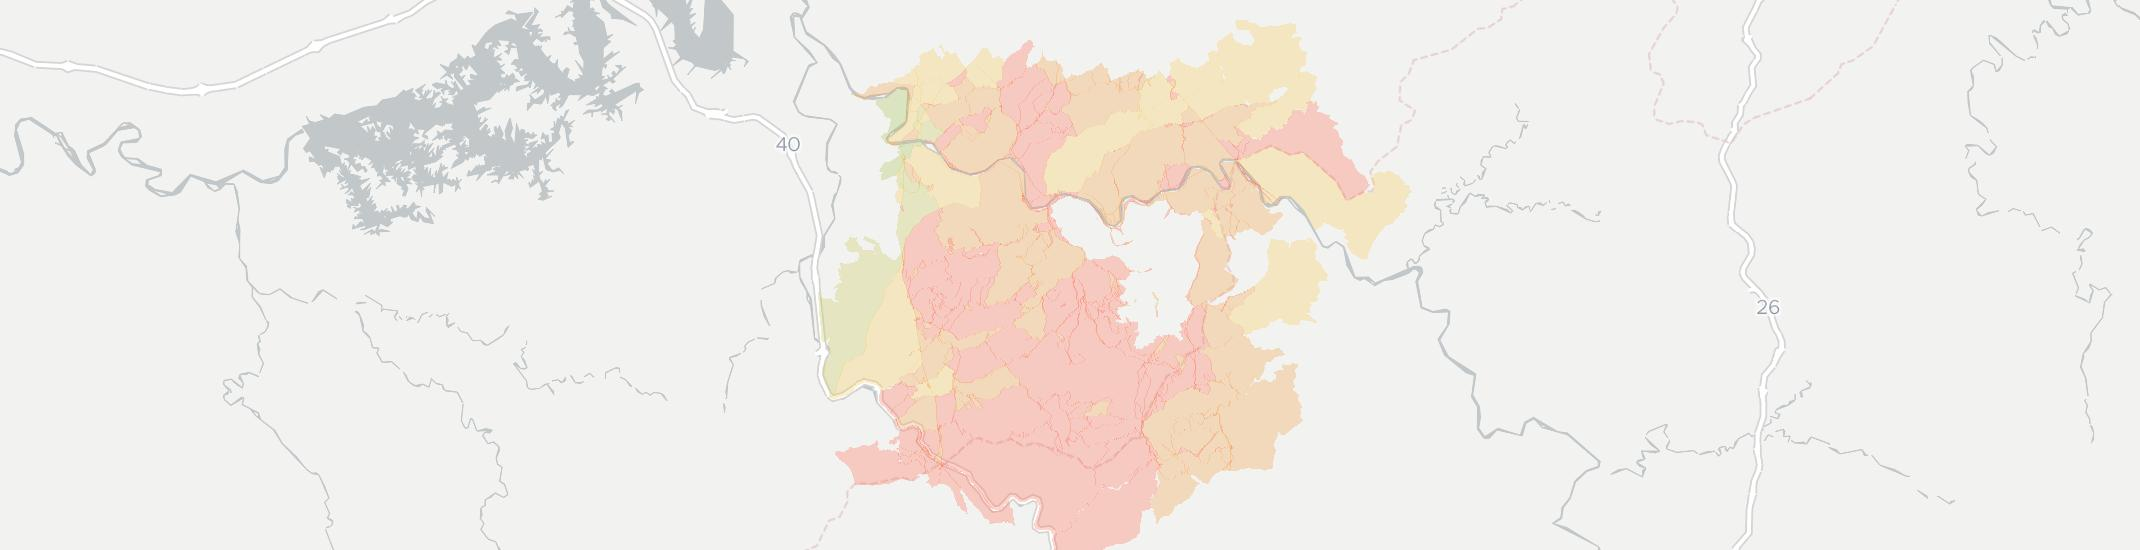 Del Rio Internet Competition Map. Click for interactive map.